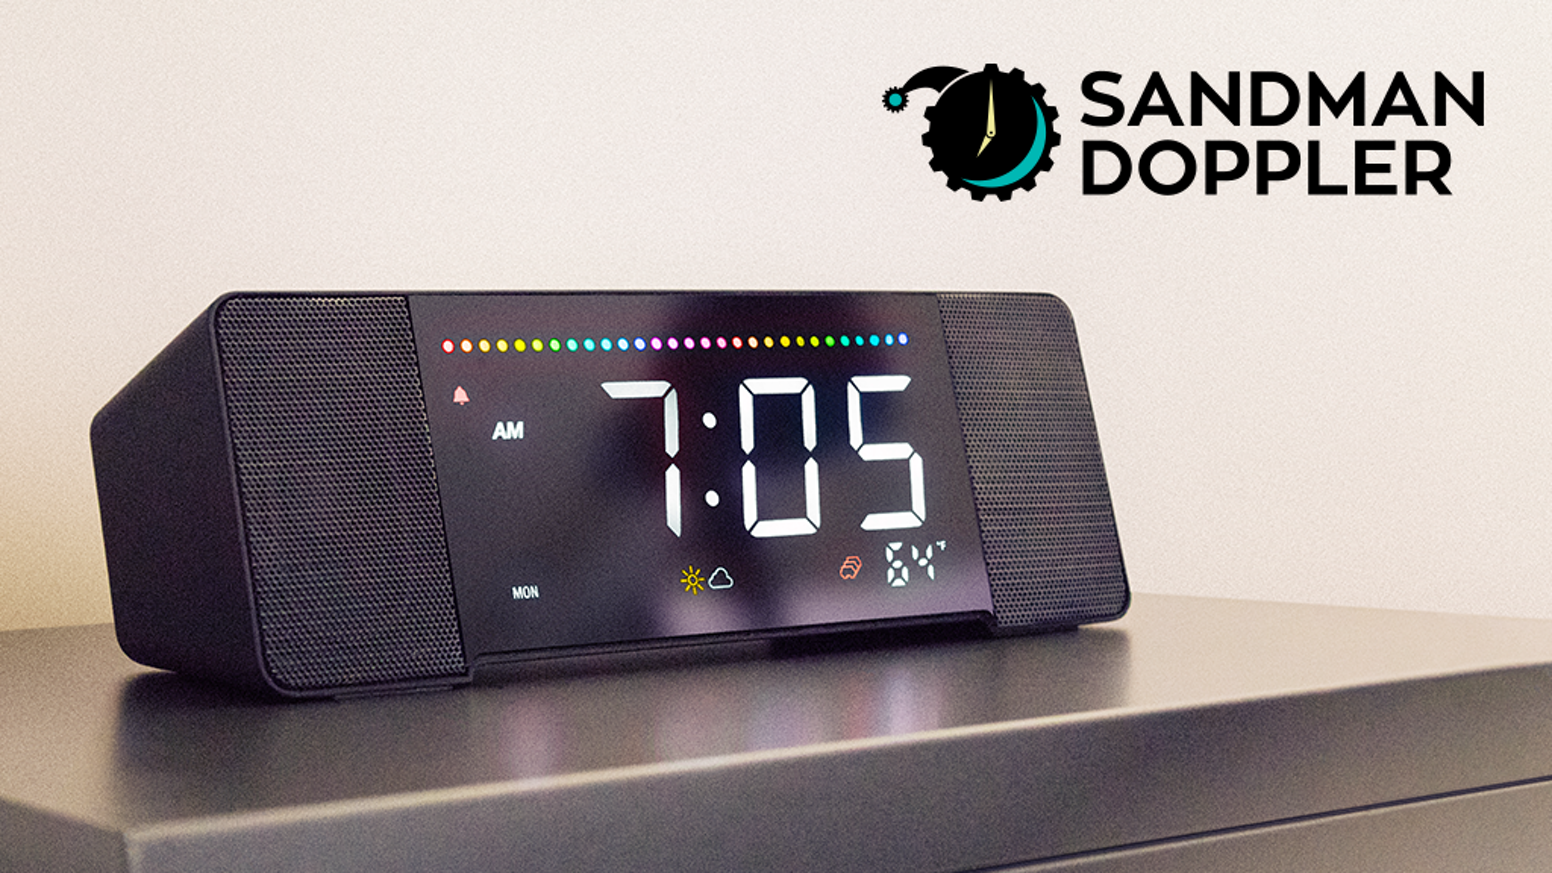 Alexa enabled, 6 USB charging ports, music playing, smart alarm clock. Meet